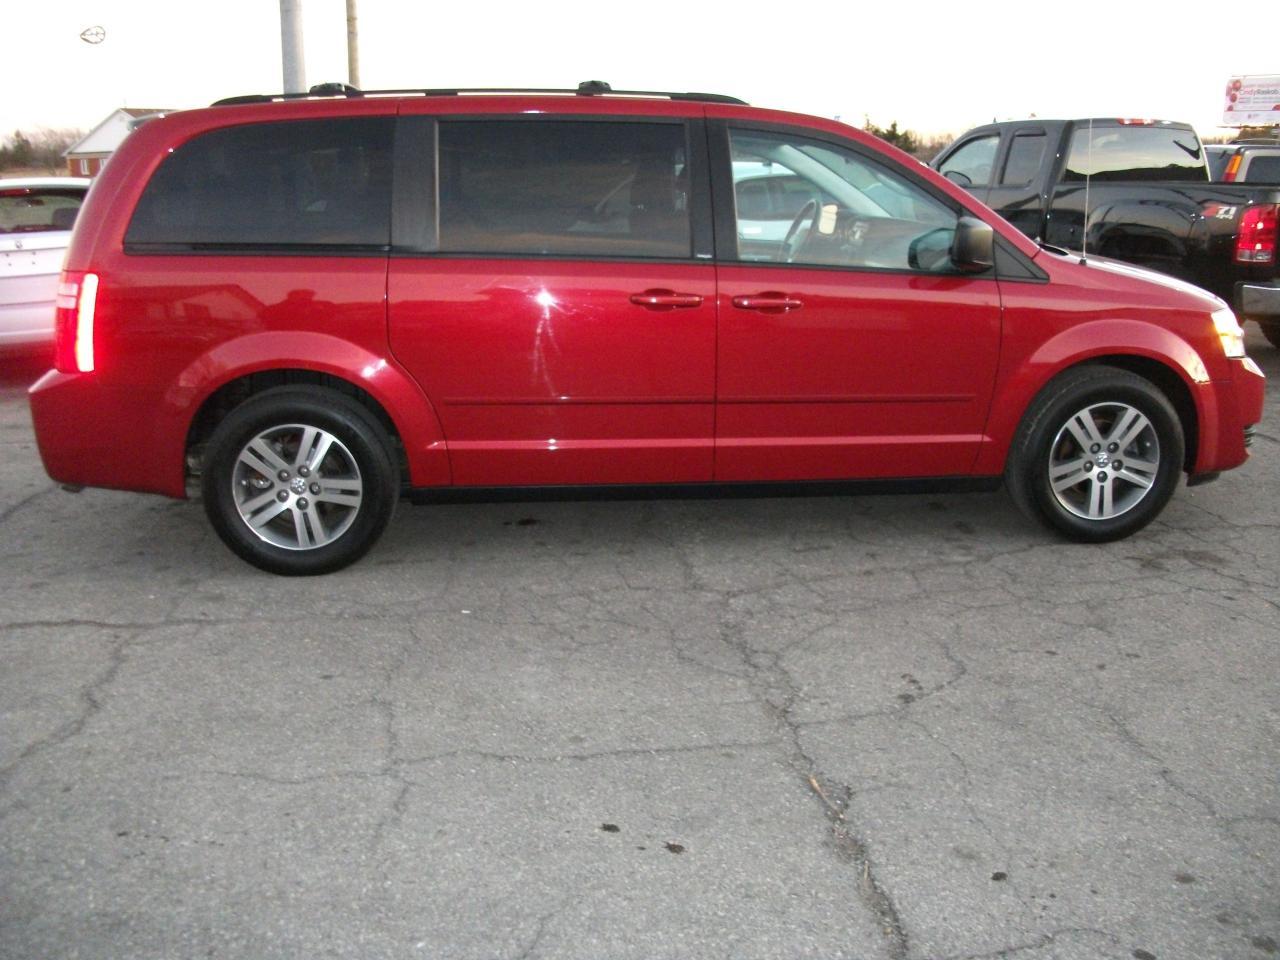 2010 Dodge Grand Caravan SE  Stow N Go